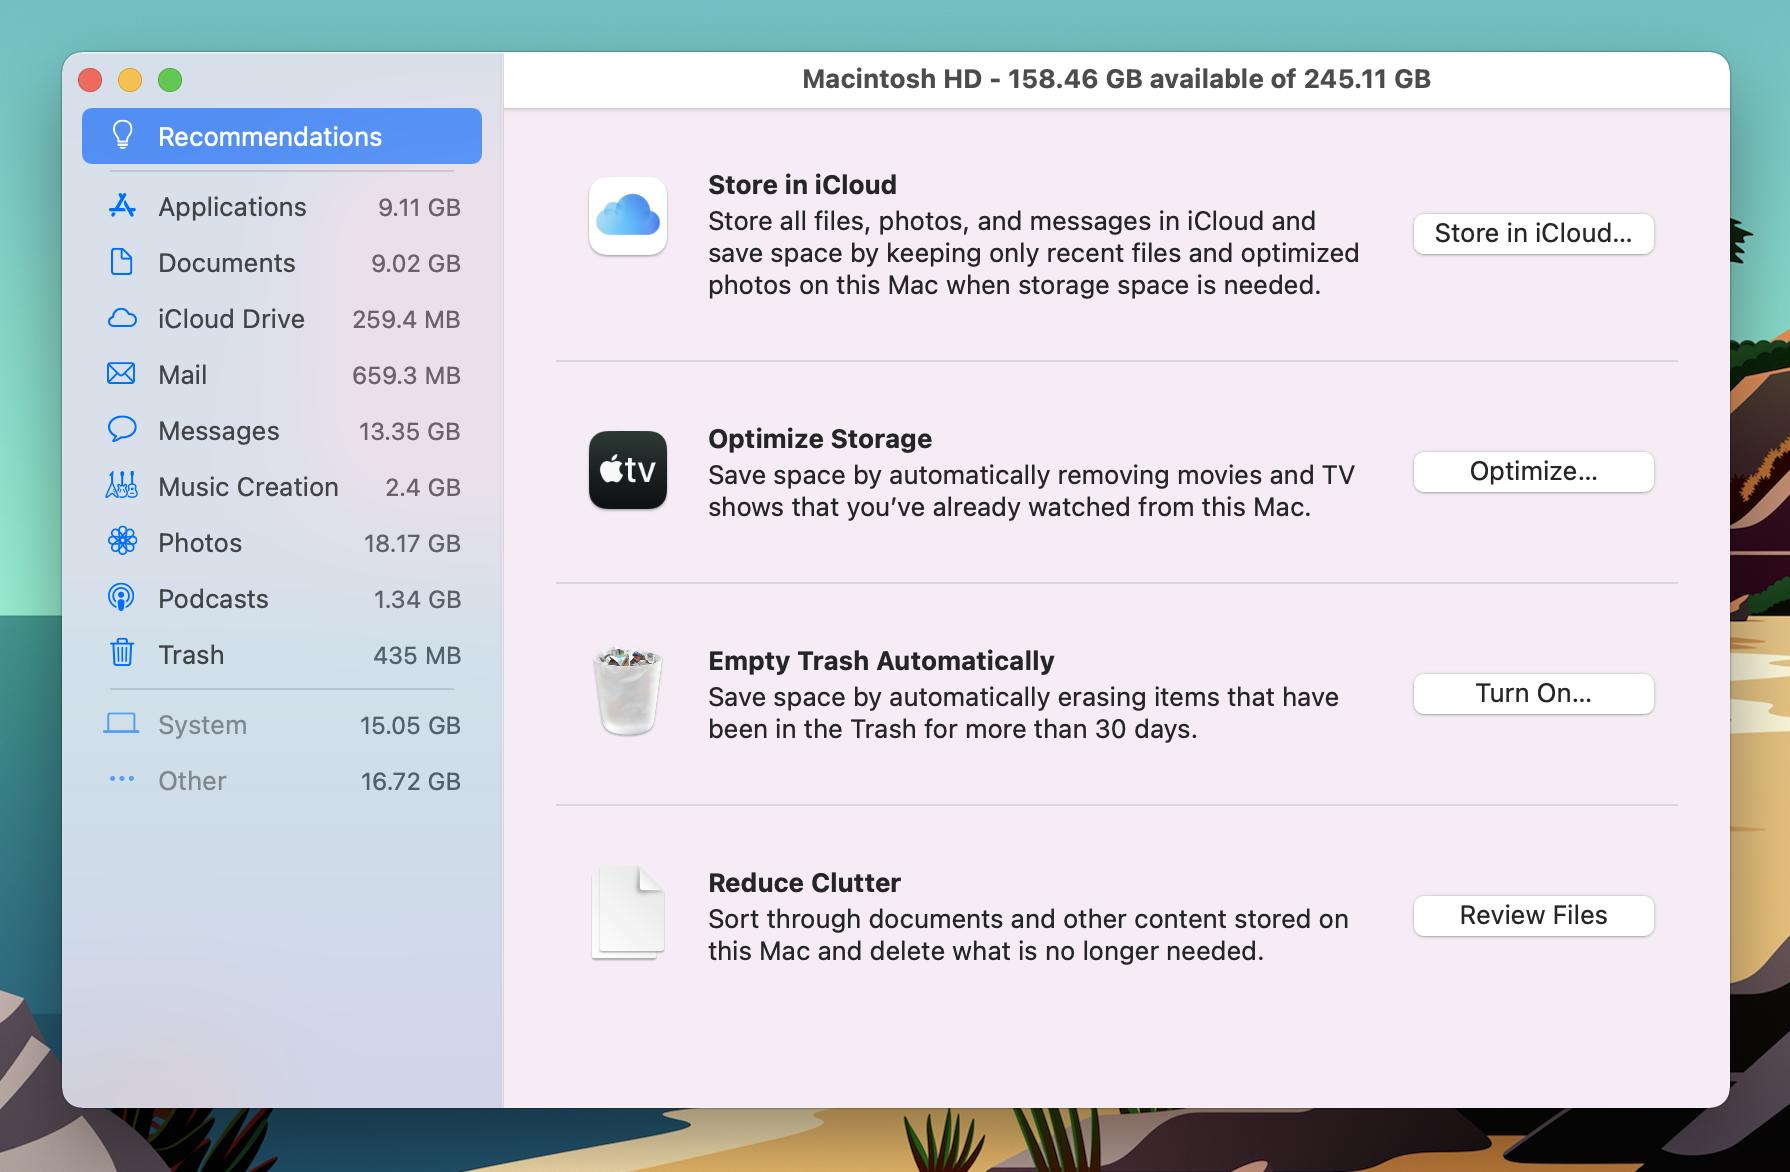 How to free up Mac storage walkthrough 2